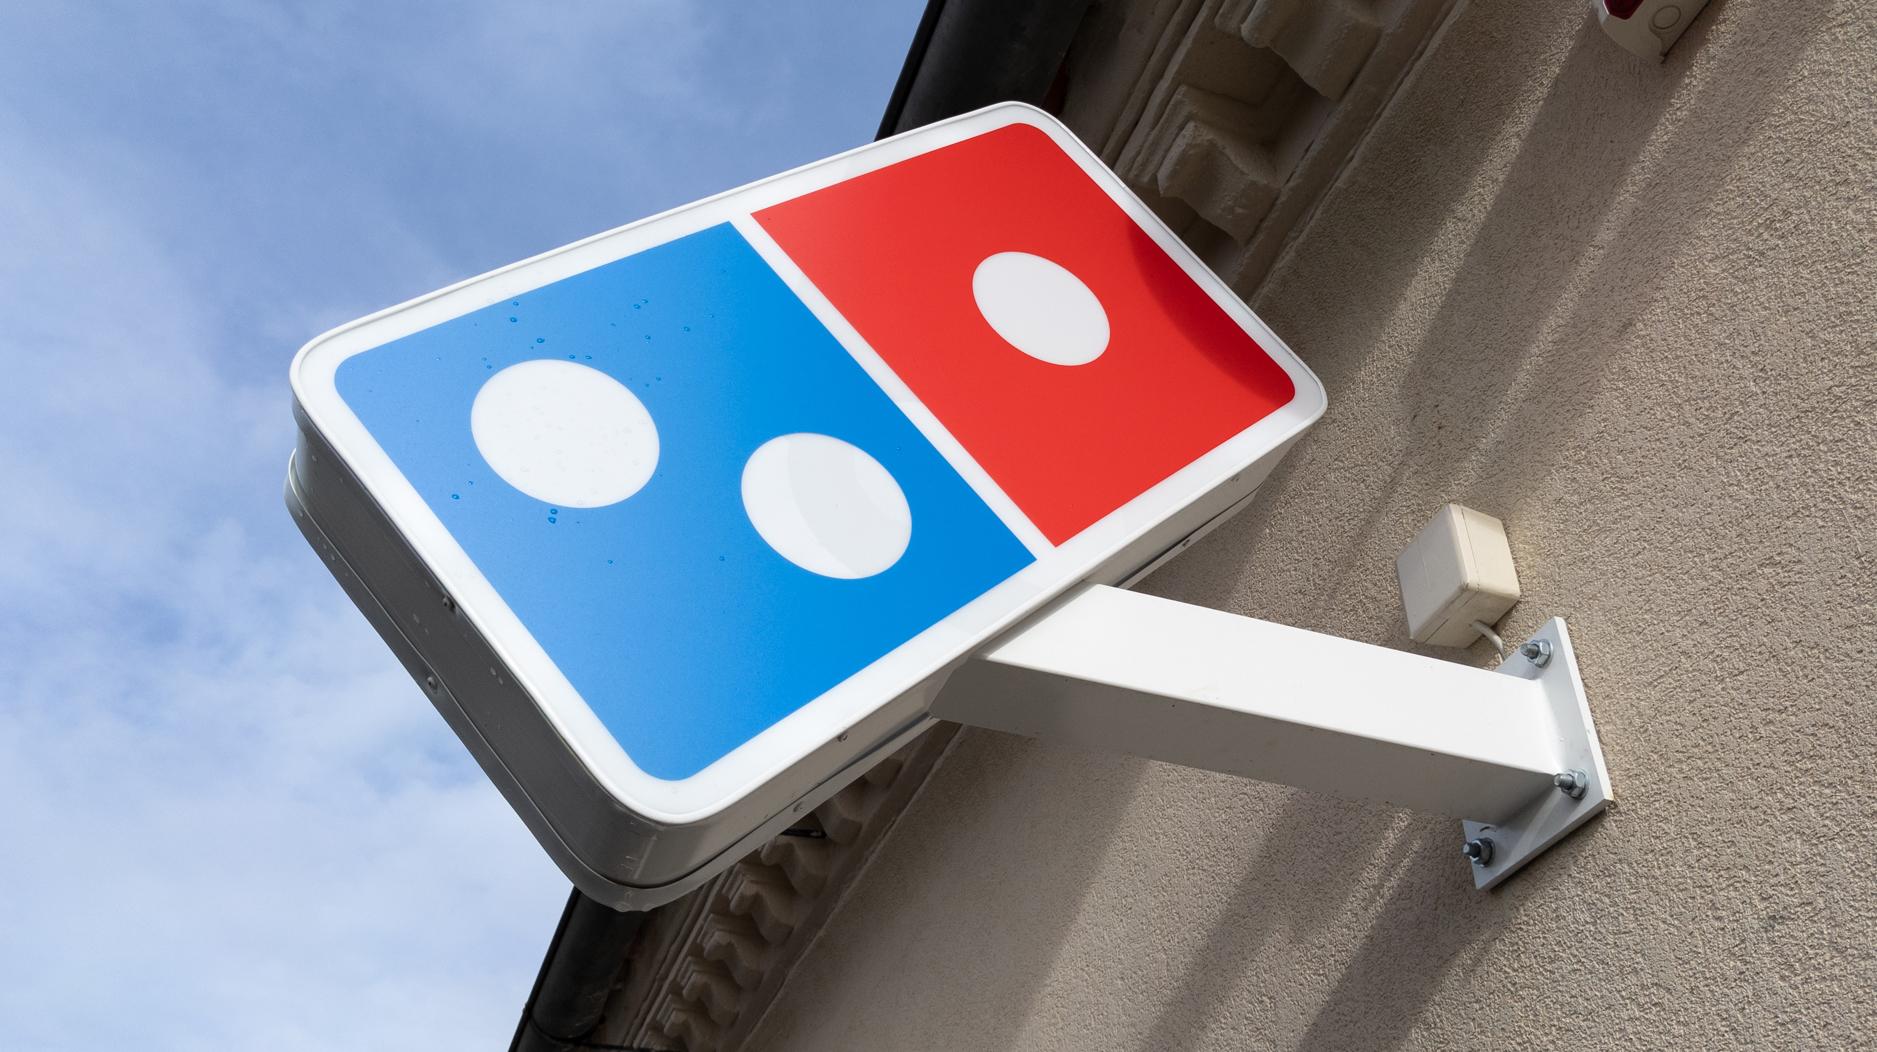 Dominos Pizza stock, Dominos stock, DPZ stock